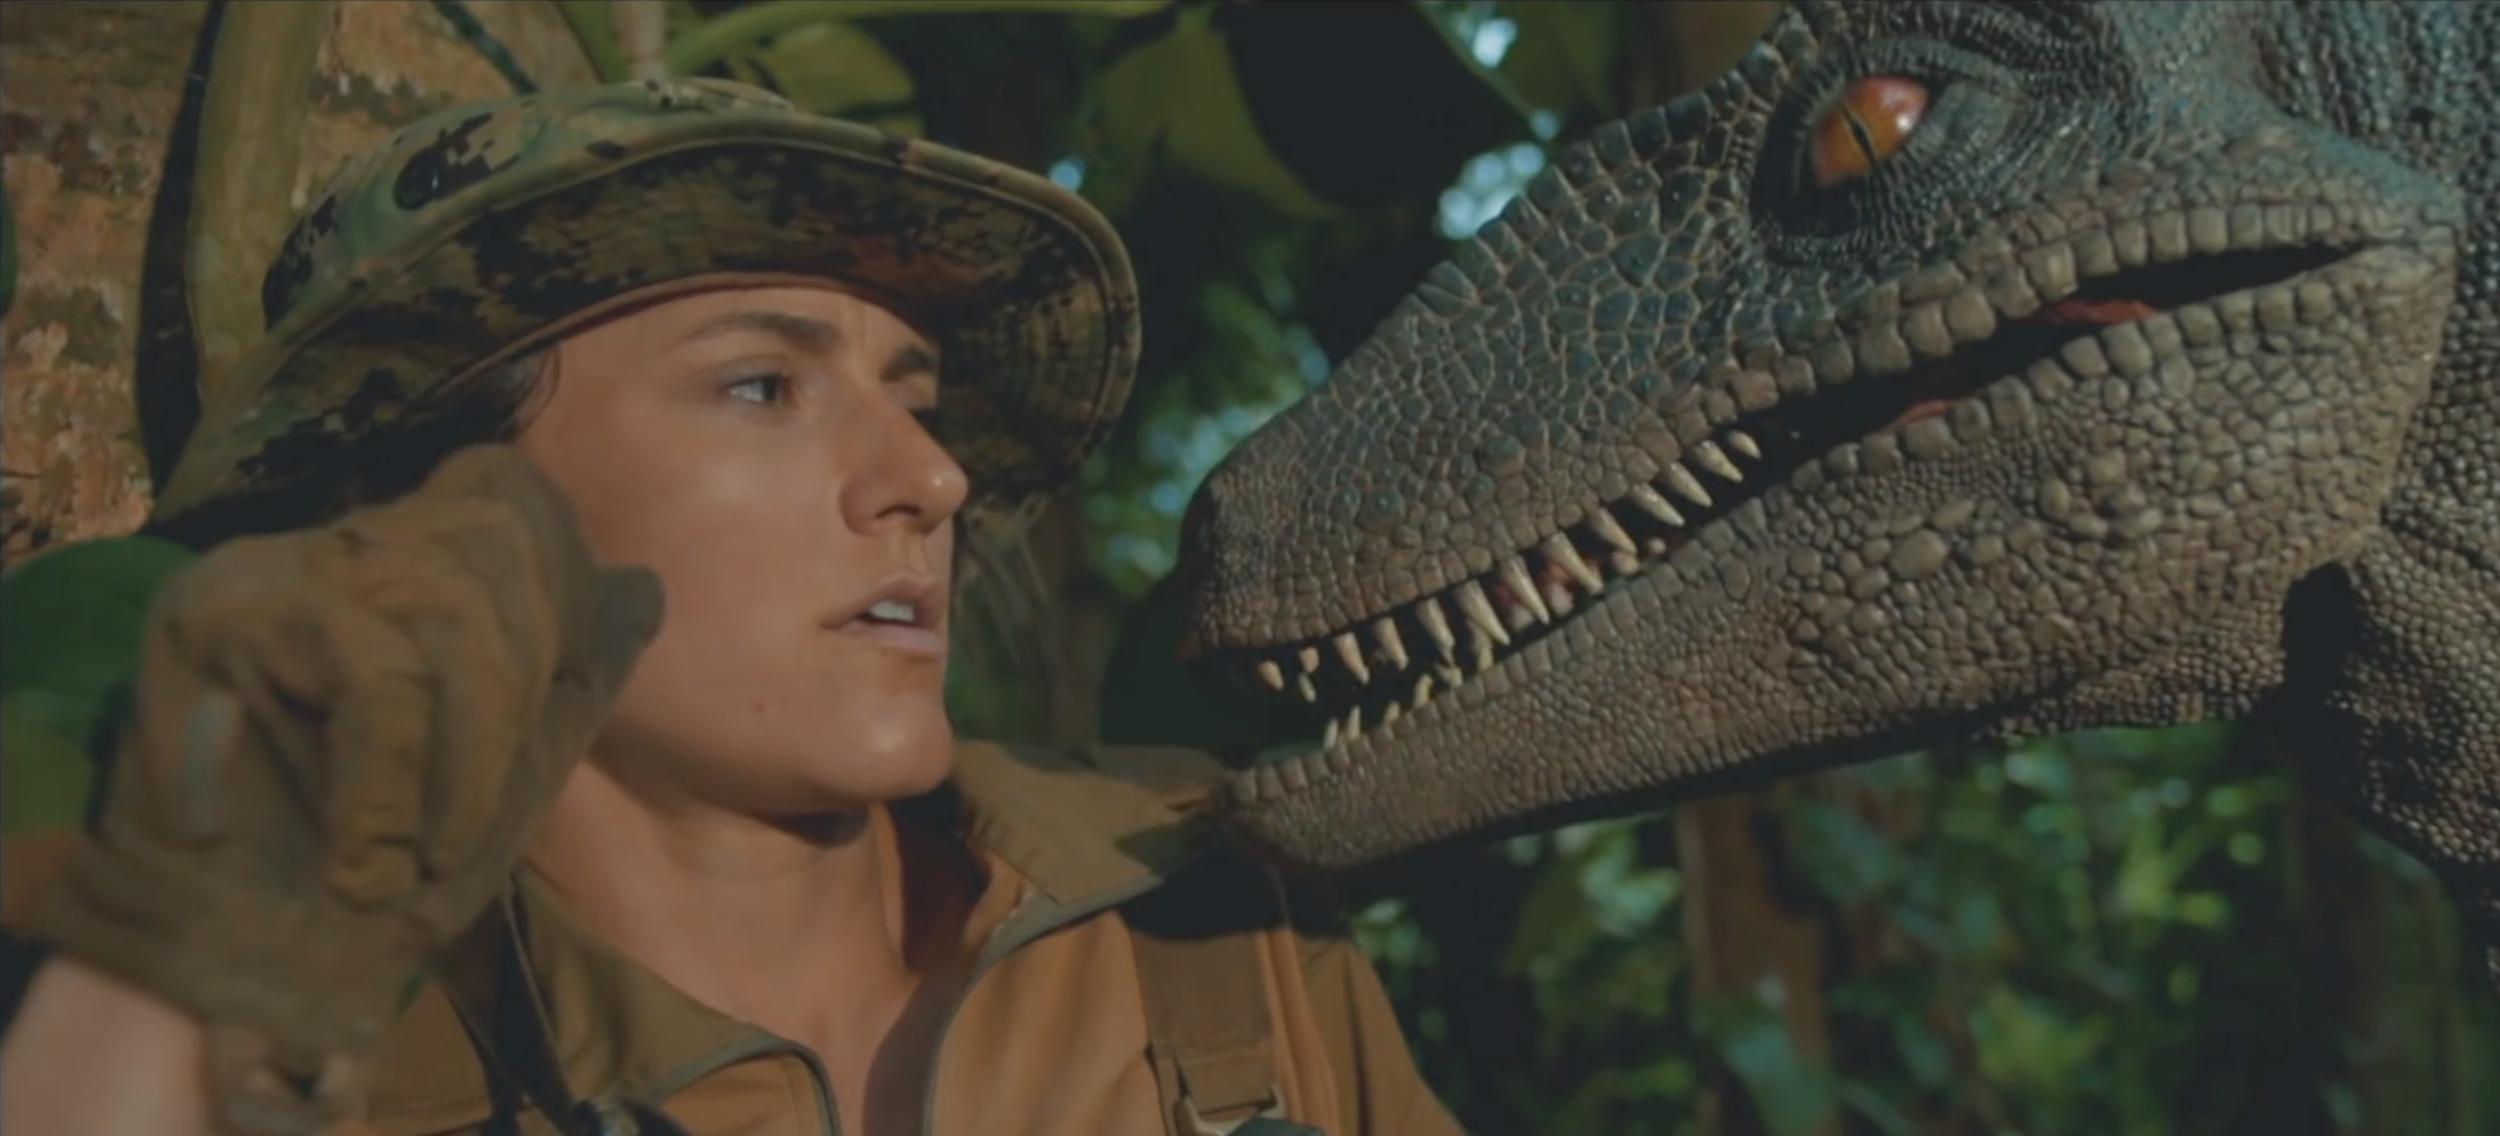 Shannon Corbeil Jurassic World Exodus.png